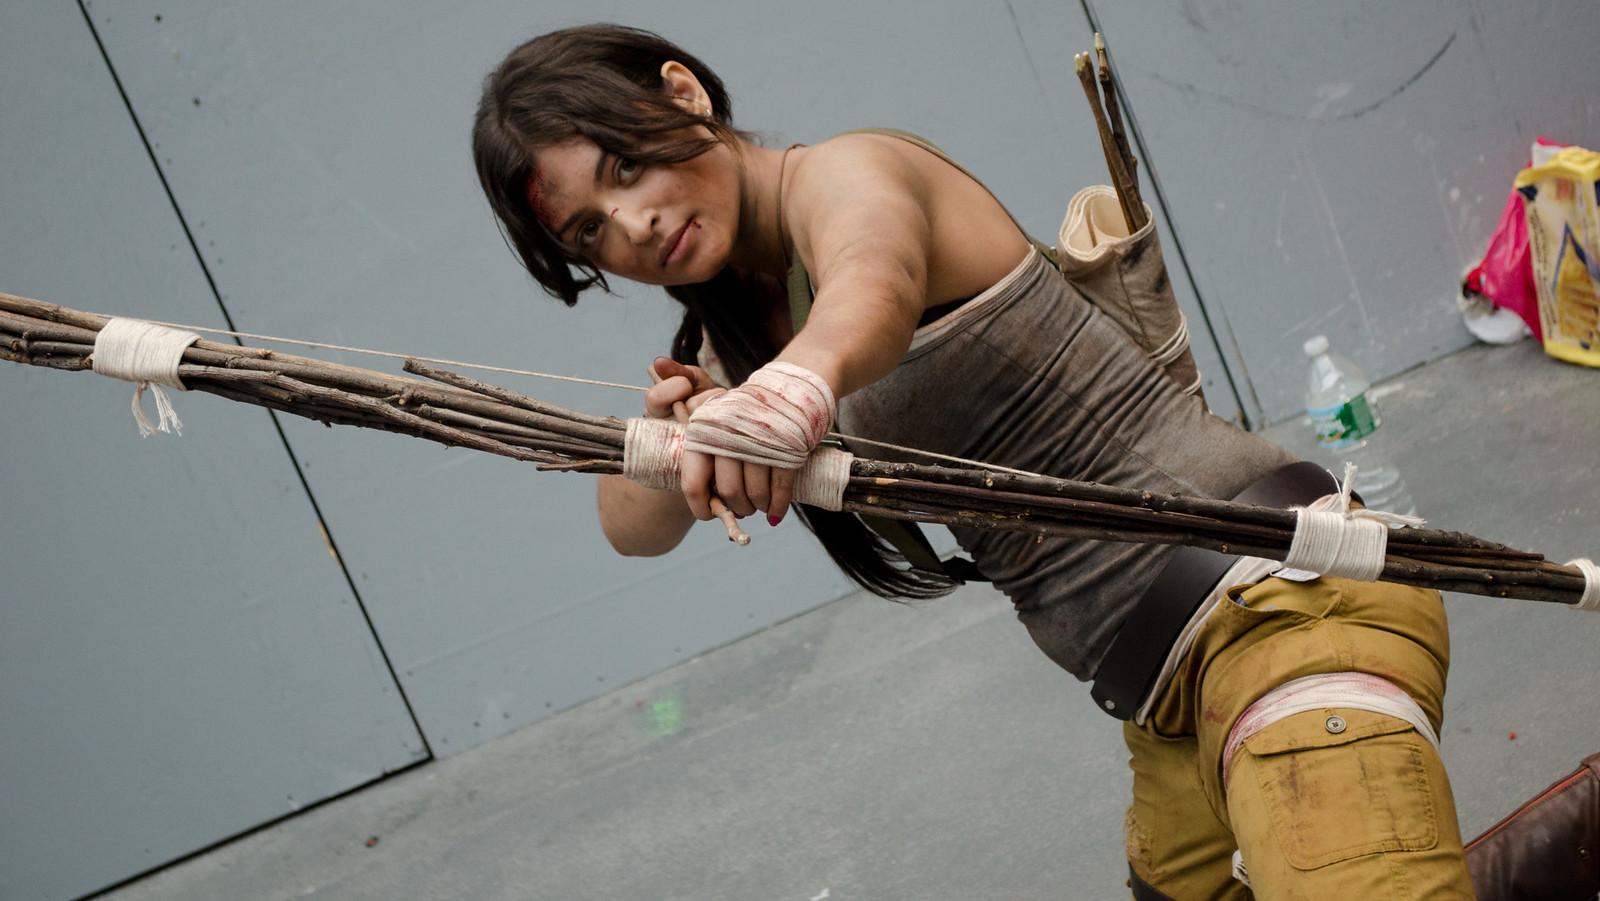 NYCC Tomb Raider Cosplay